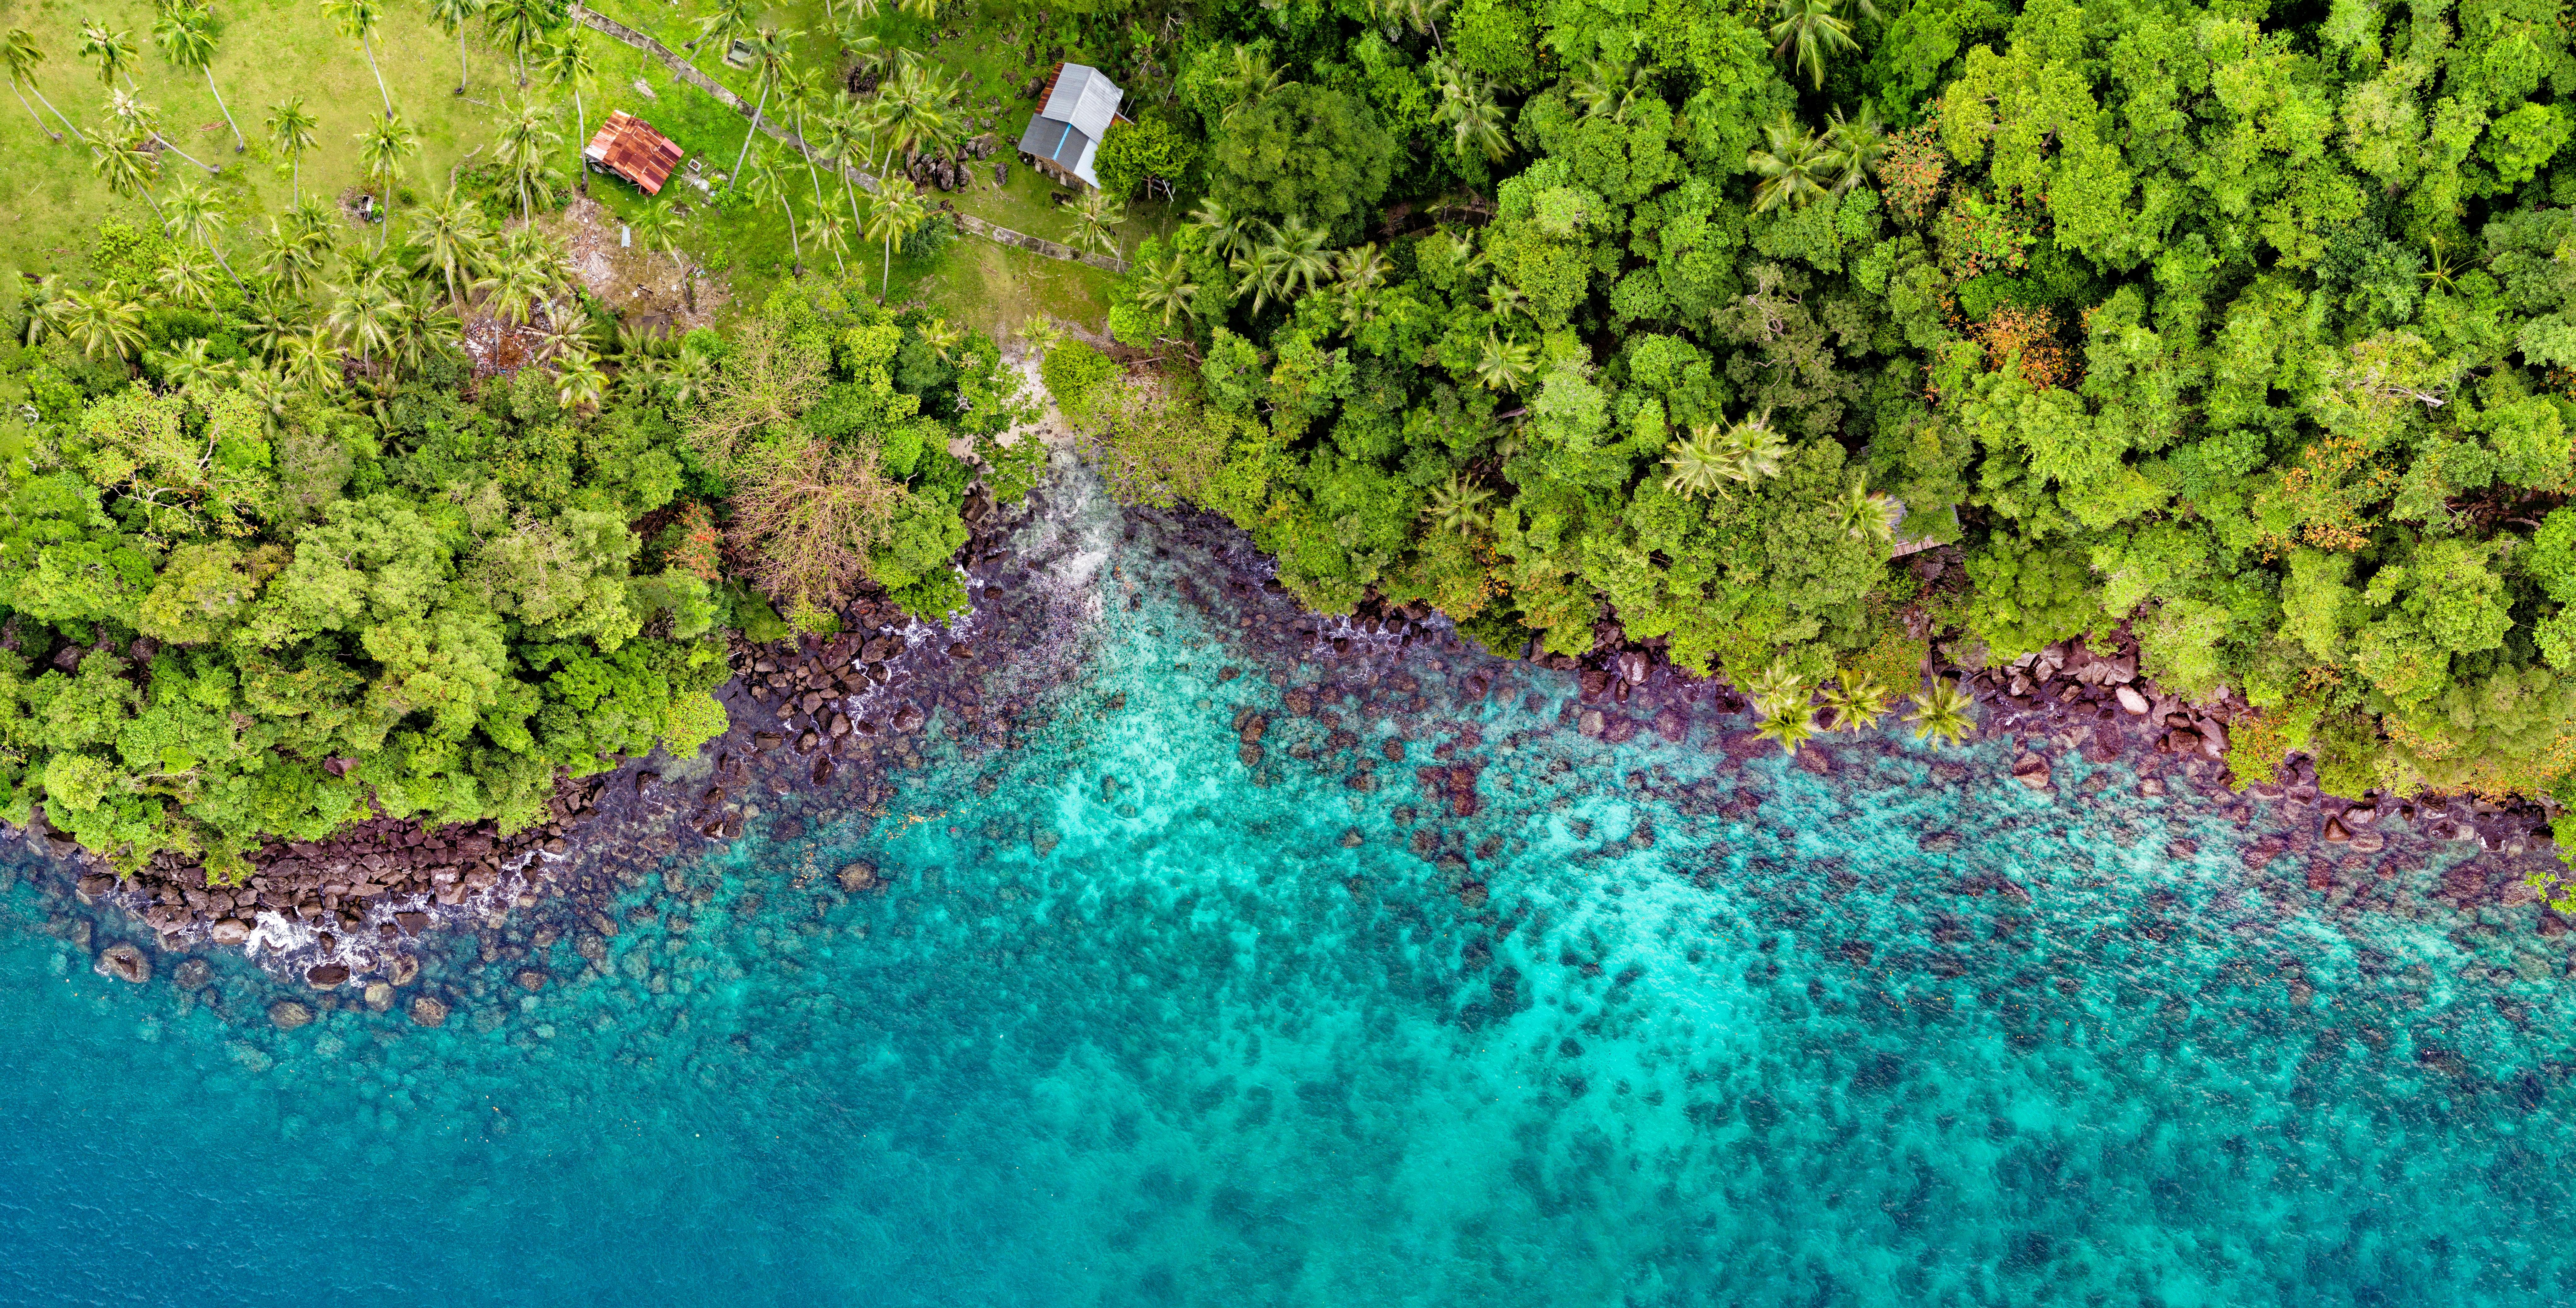 Free Images : 4k wallpaper, aerial